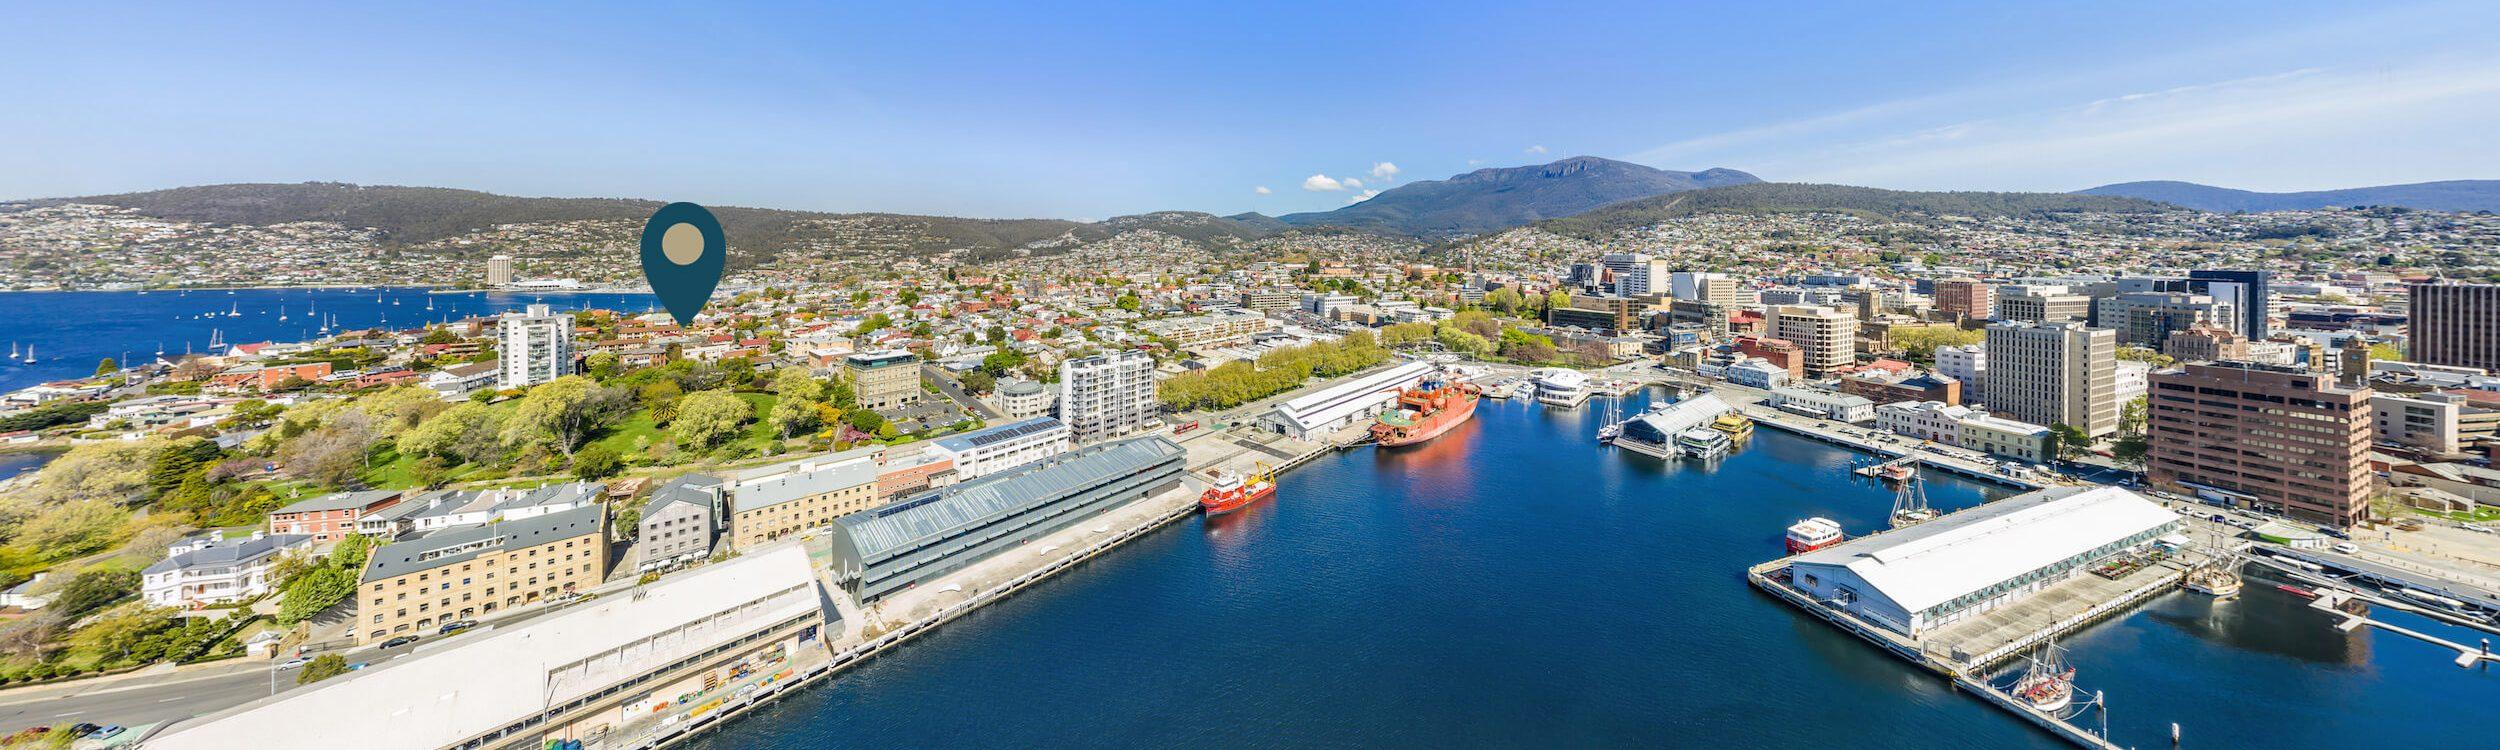 Sullivans Cove Apaprtments - 5 star apartments in Hobart